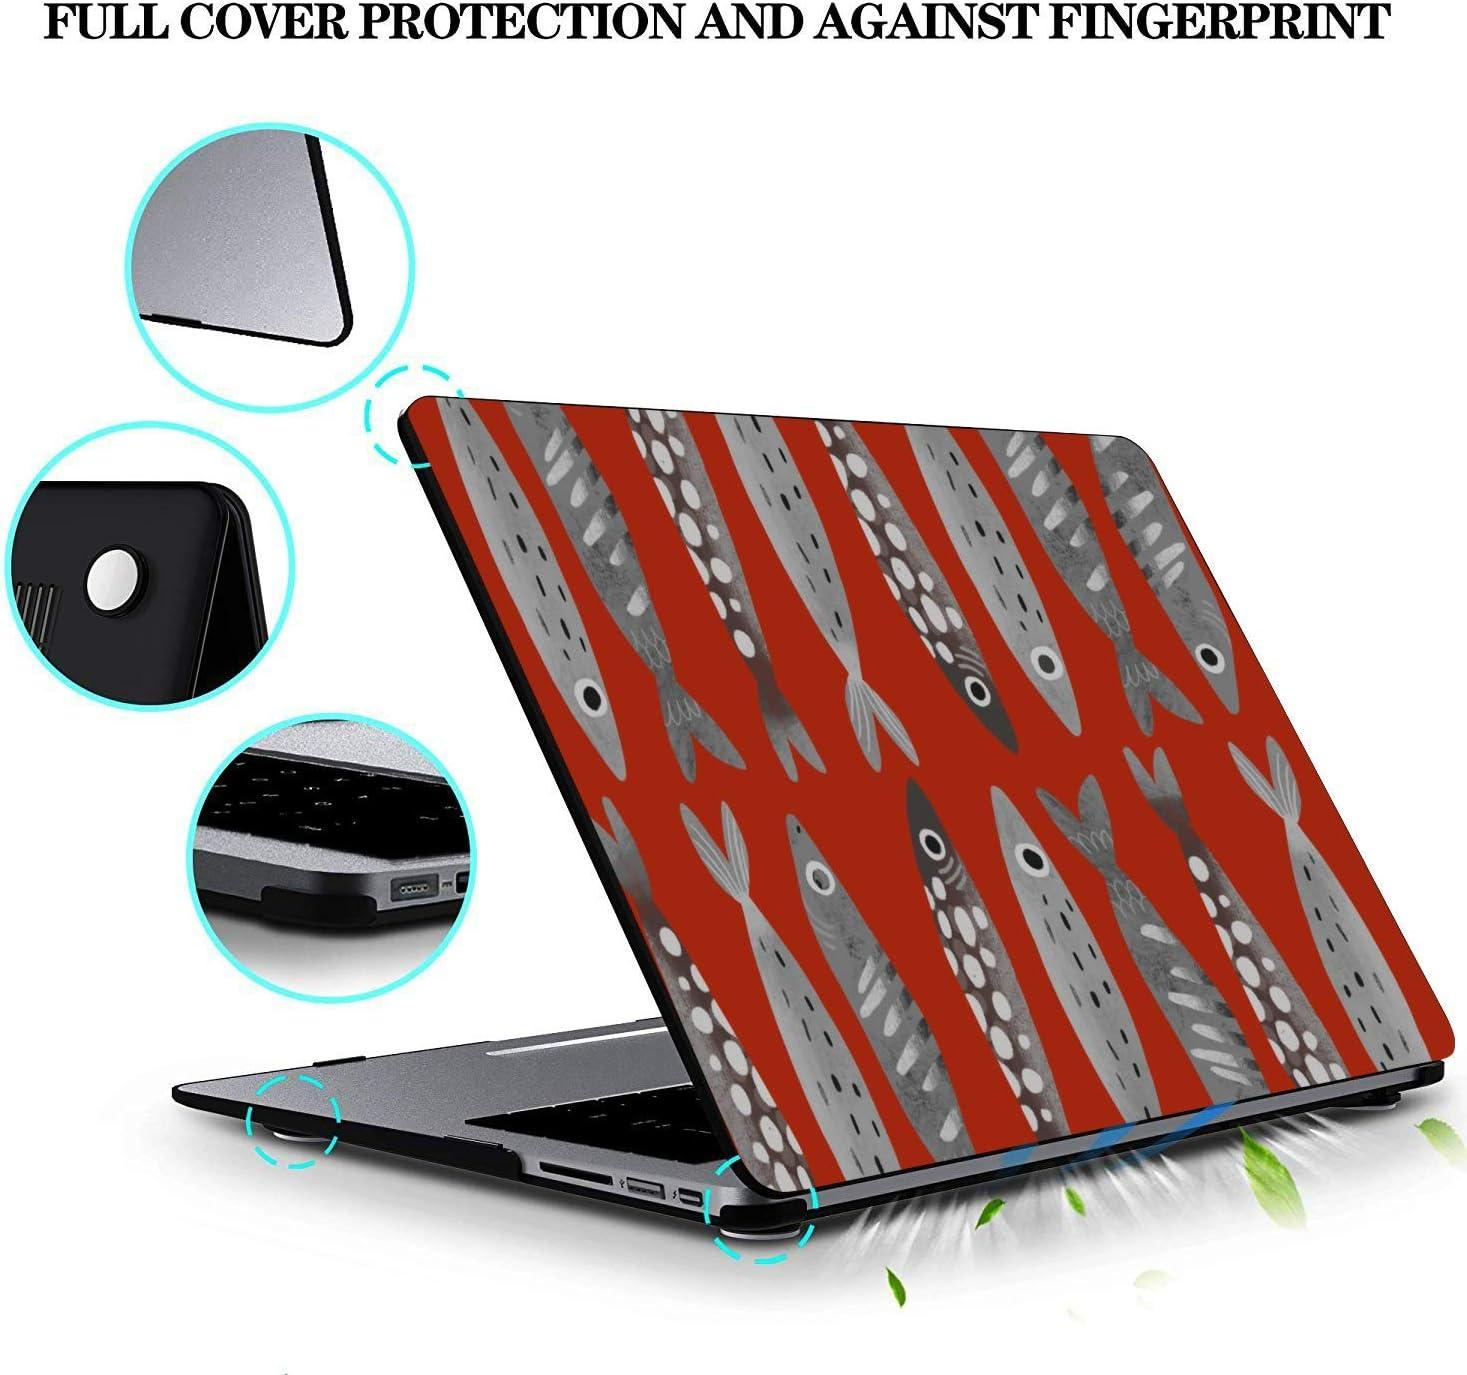 2017 MacBook Pro Case Sea Creatures Ornamental Fish Squid Plastic Hard Shell Compatible Mac Air 11 Pro 13 15 MacBook Cover Protection for MacBook 2016-2019 Version